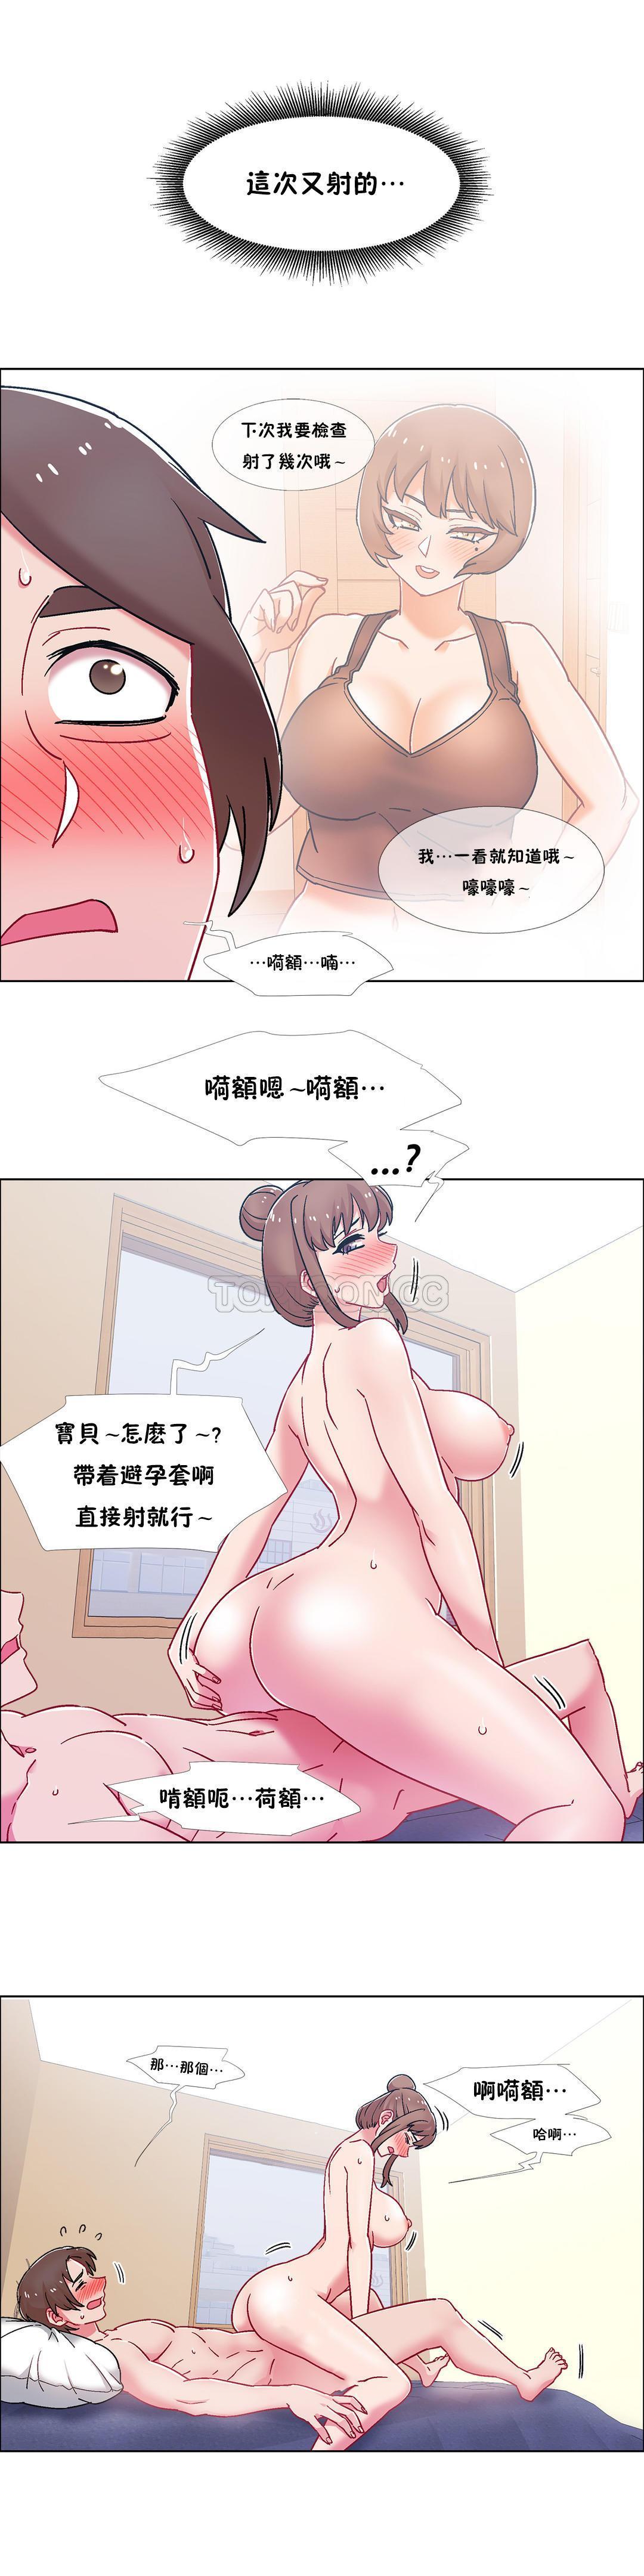 [Studio Wannabe] Rental Girls | 出租女郎 Ch. 33-58 [Chinese]  第二季 完结 415